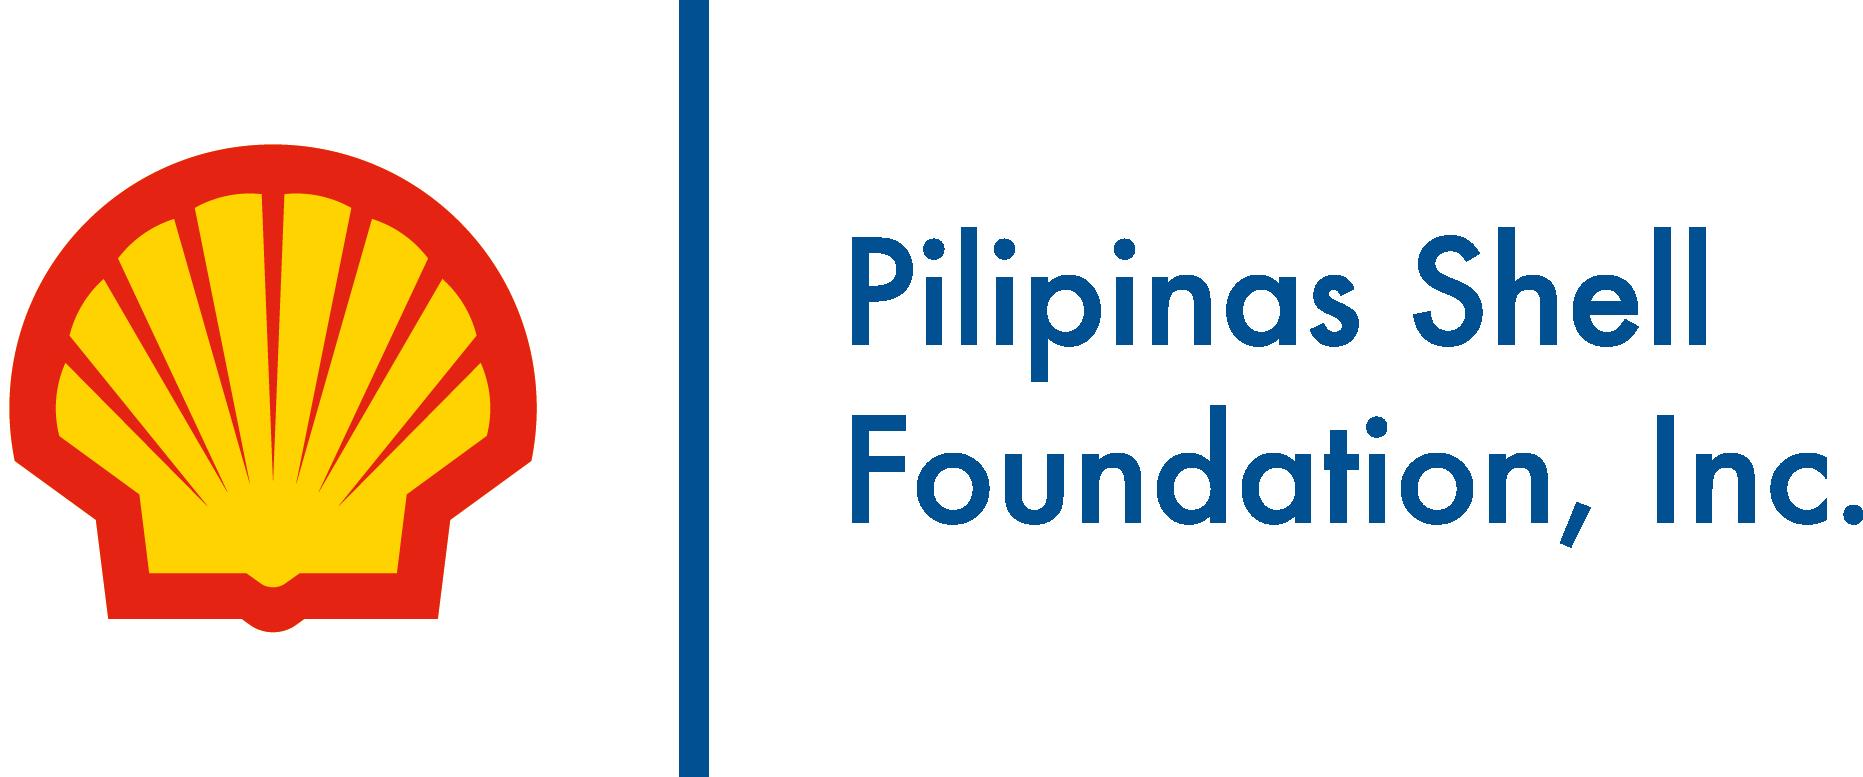 Pilipinas Shell Foundation Inc.